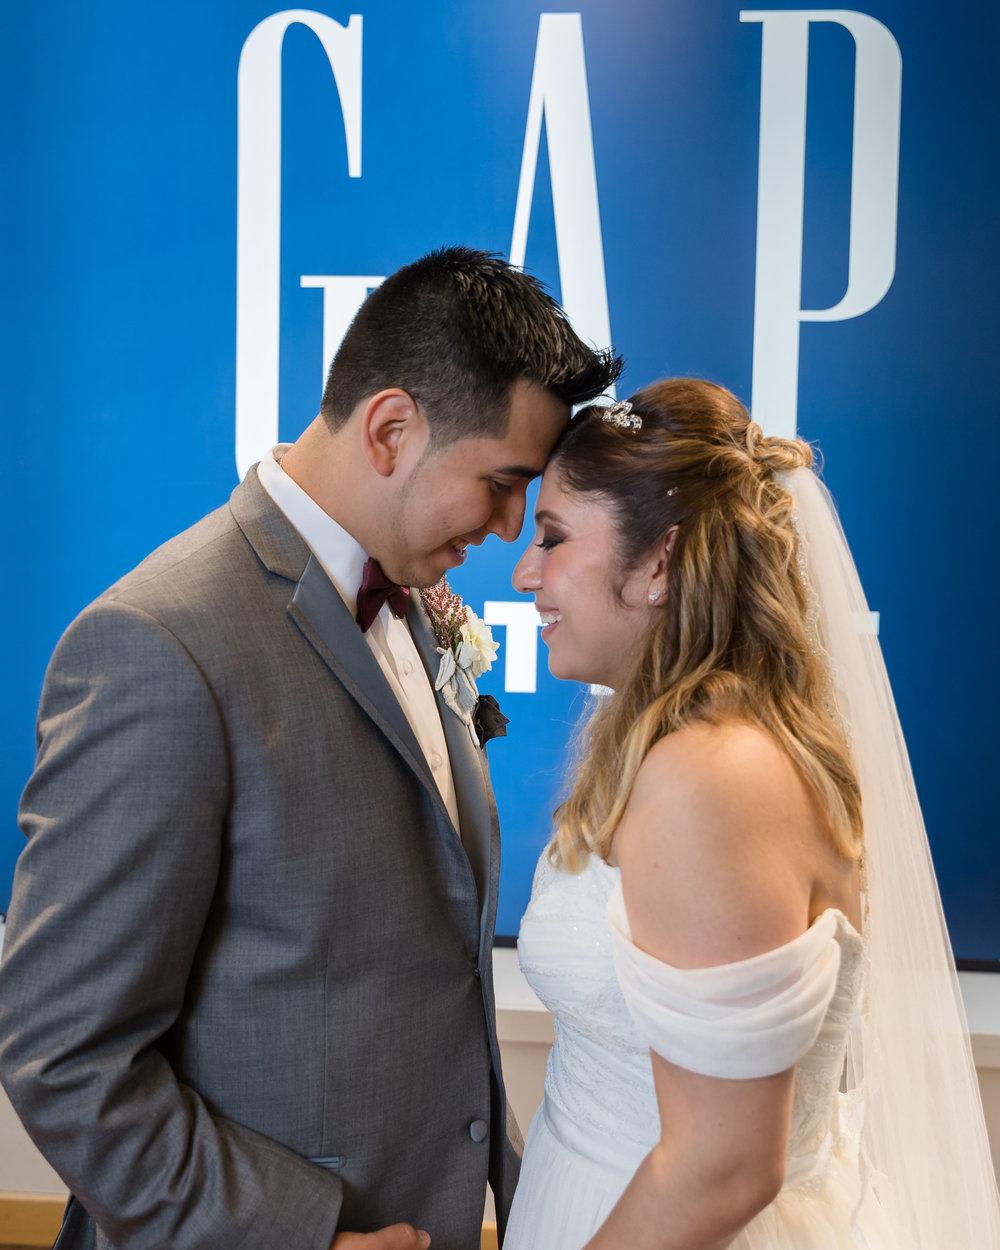 JVaughn_Photography_Weddings_Huntley_Photographer_Professional_Wedding0354.jpg